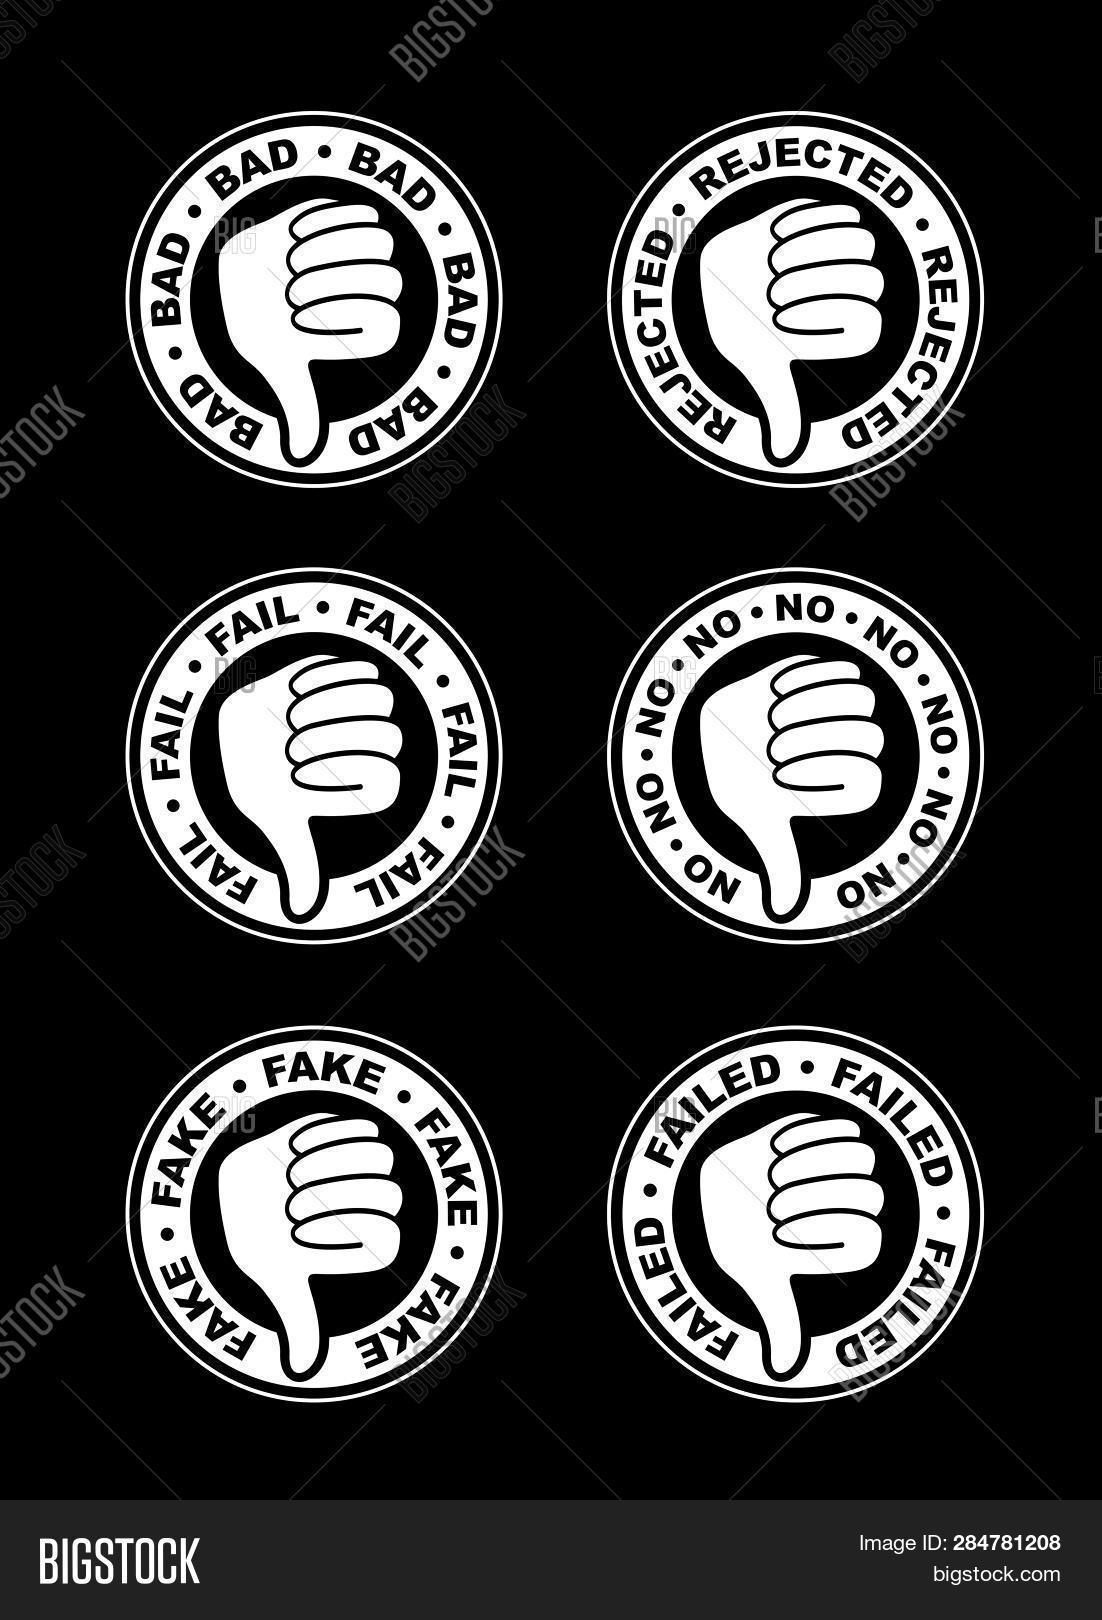 Health Safety Logos Vector Photo Free Trial Bigstock